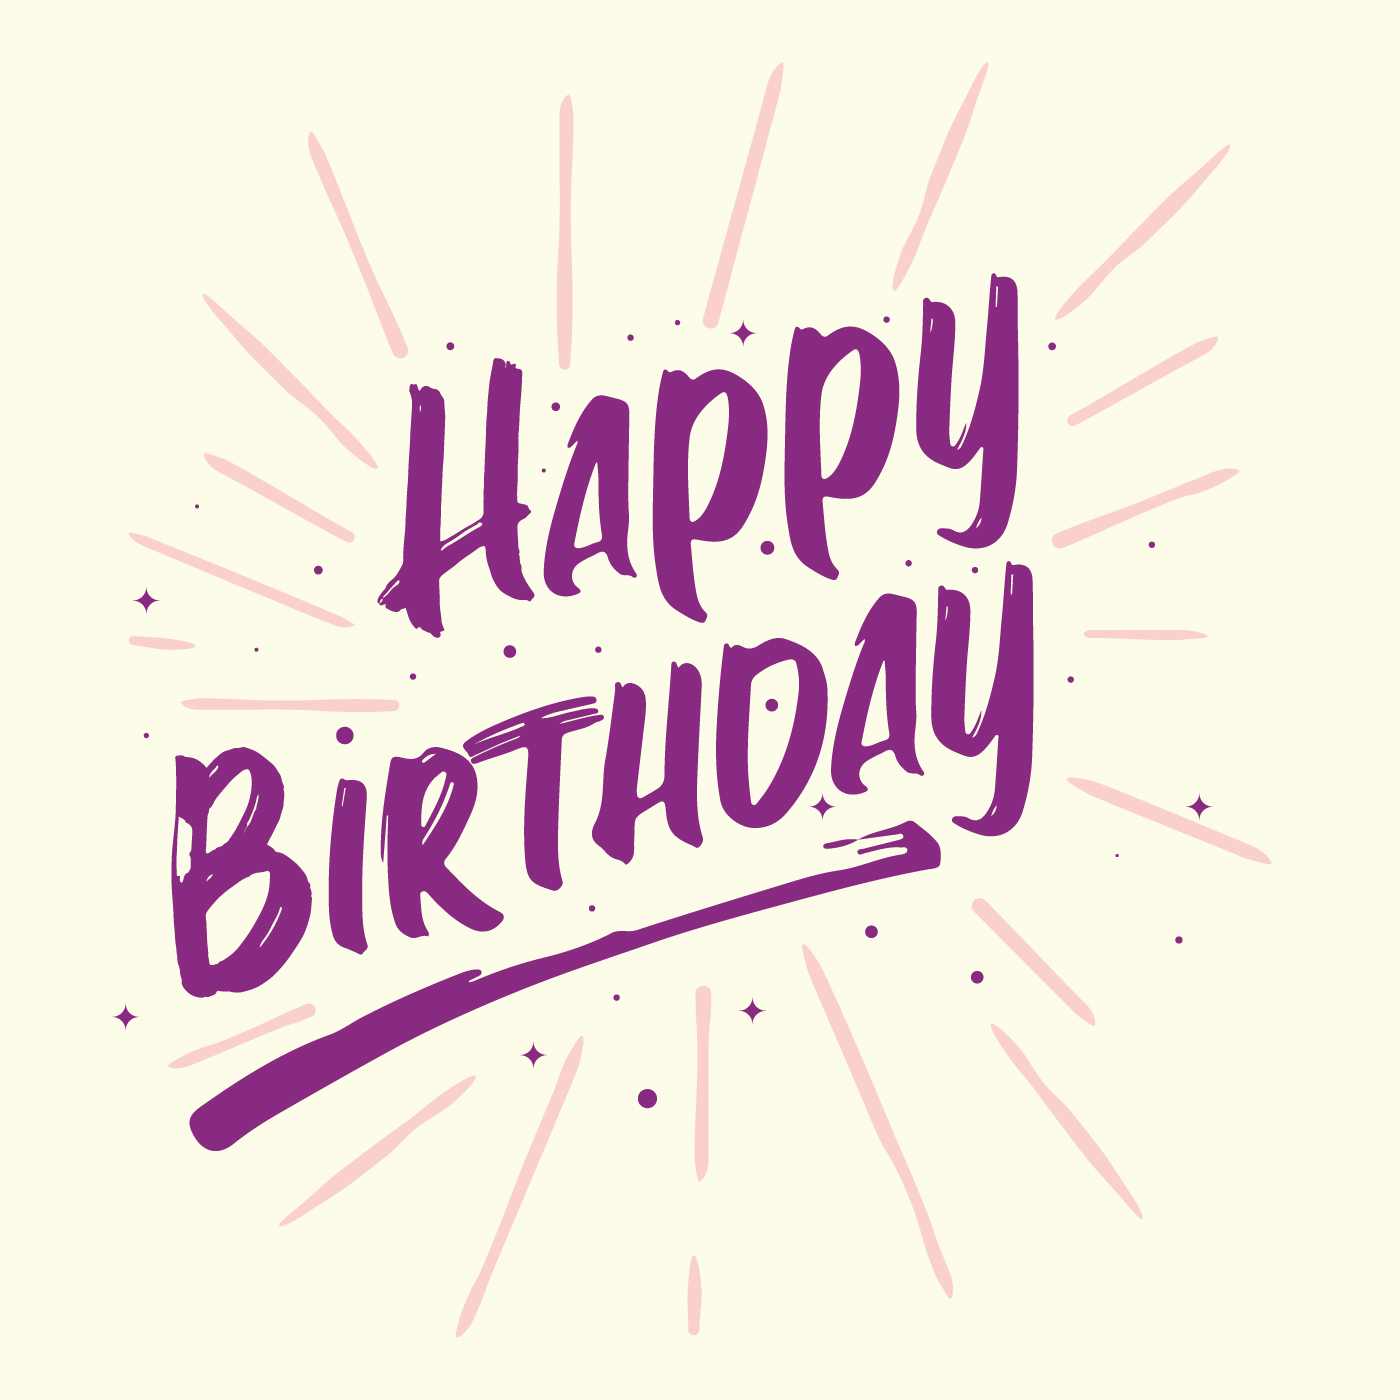 happy birthday beautiful greeting card poster 545683